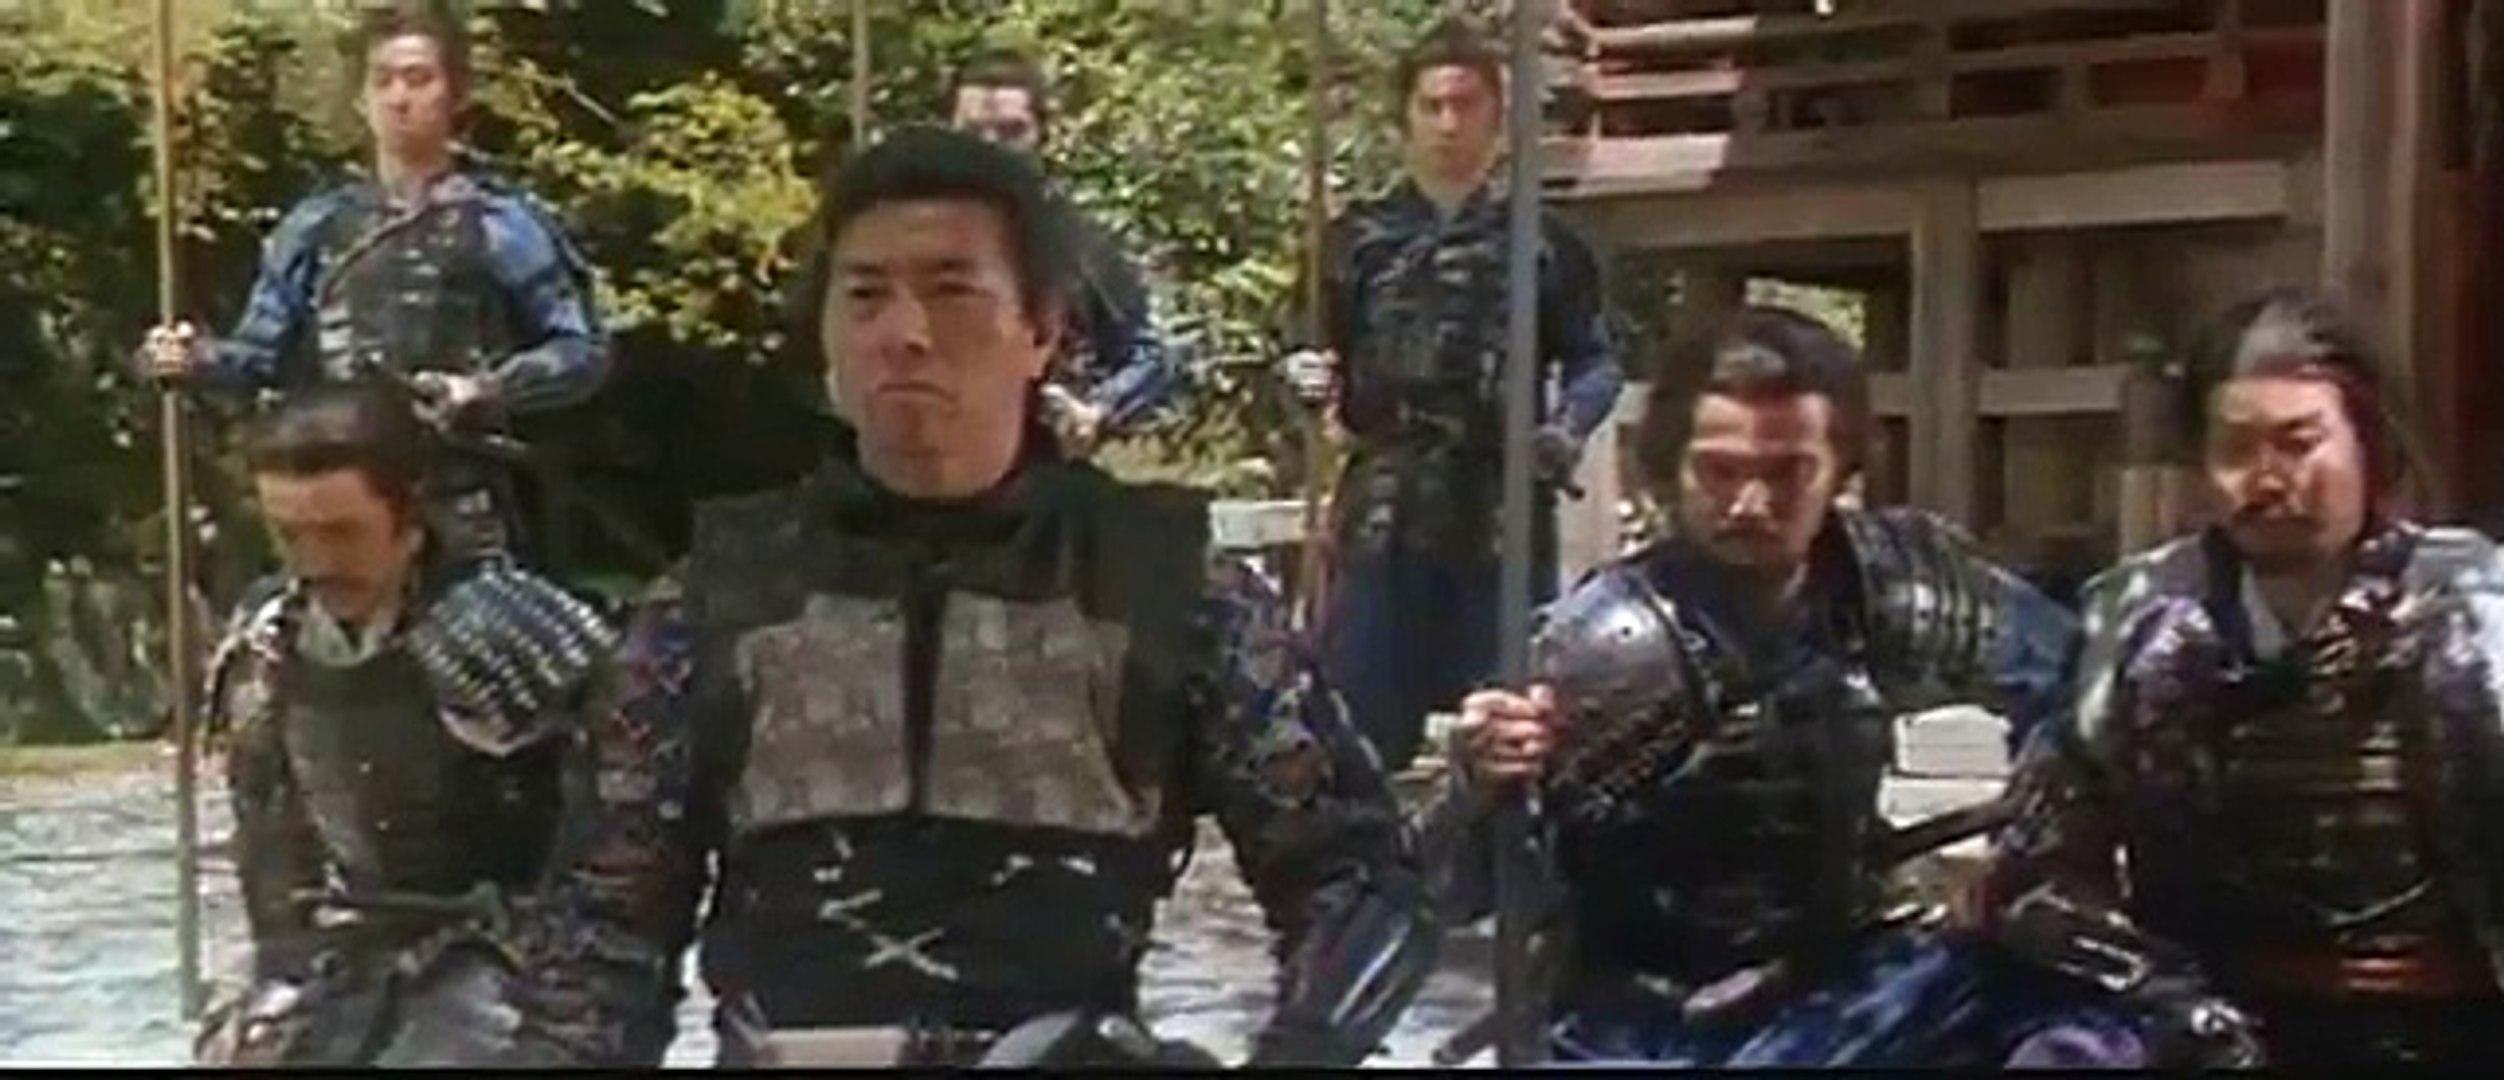 Journey of Honor, Kabuto, 名誉の旅, 1991 part 1/2